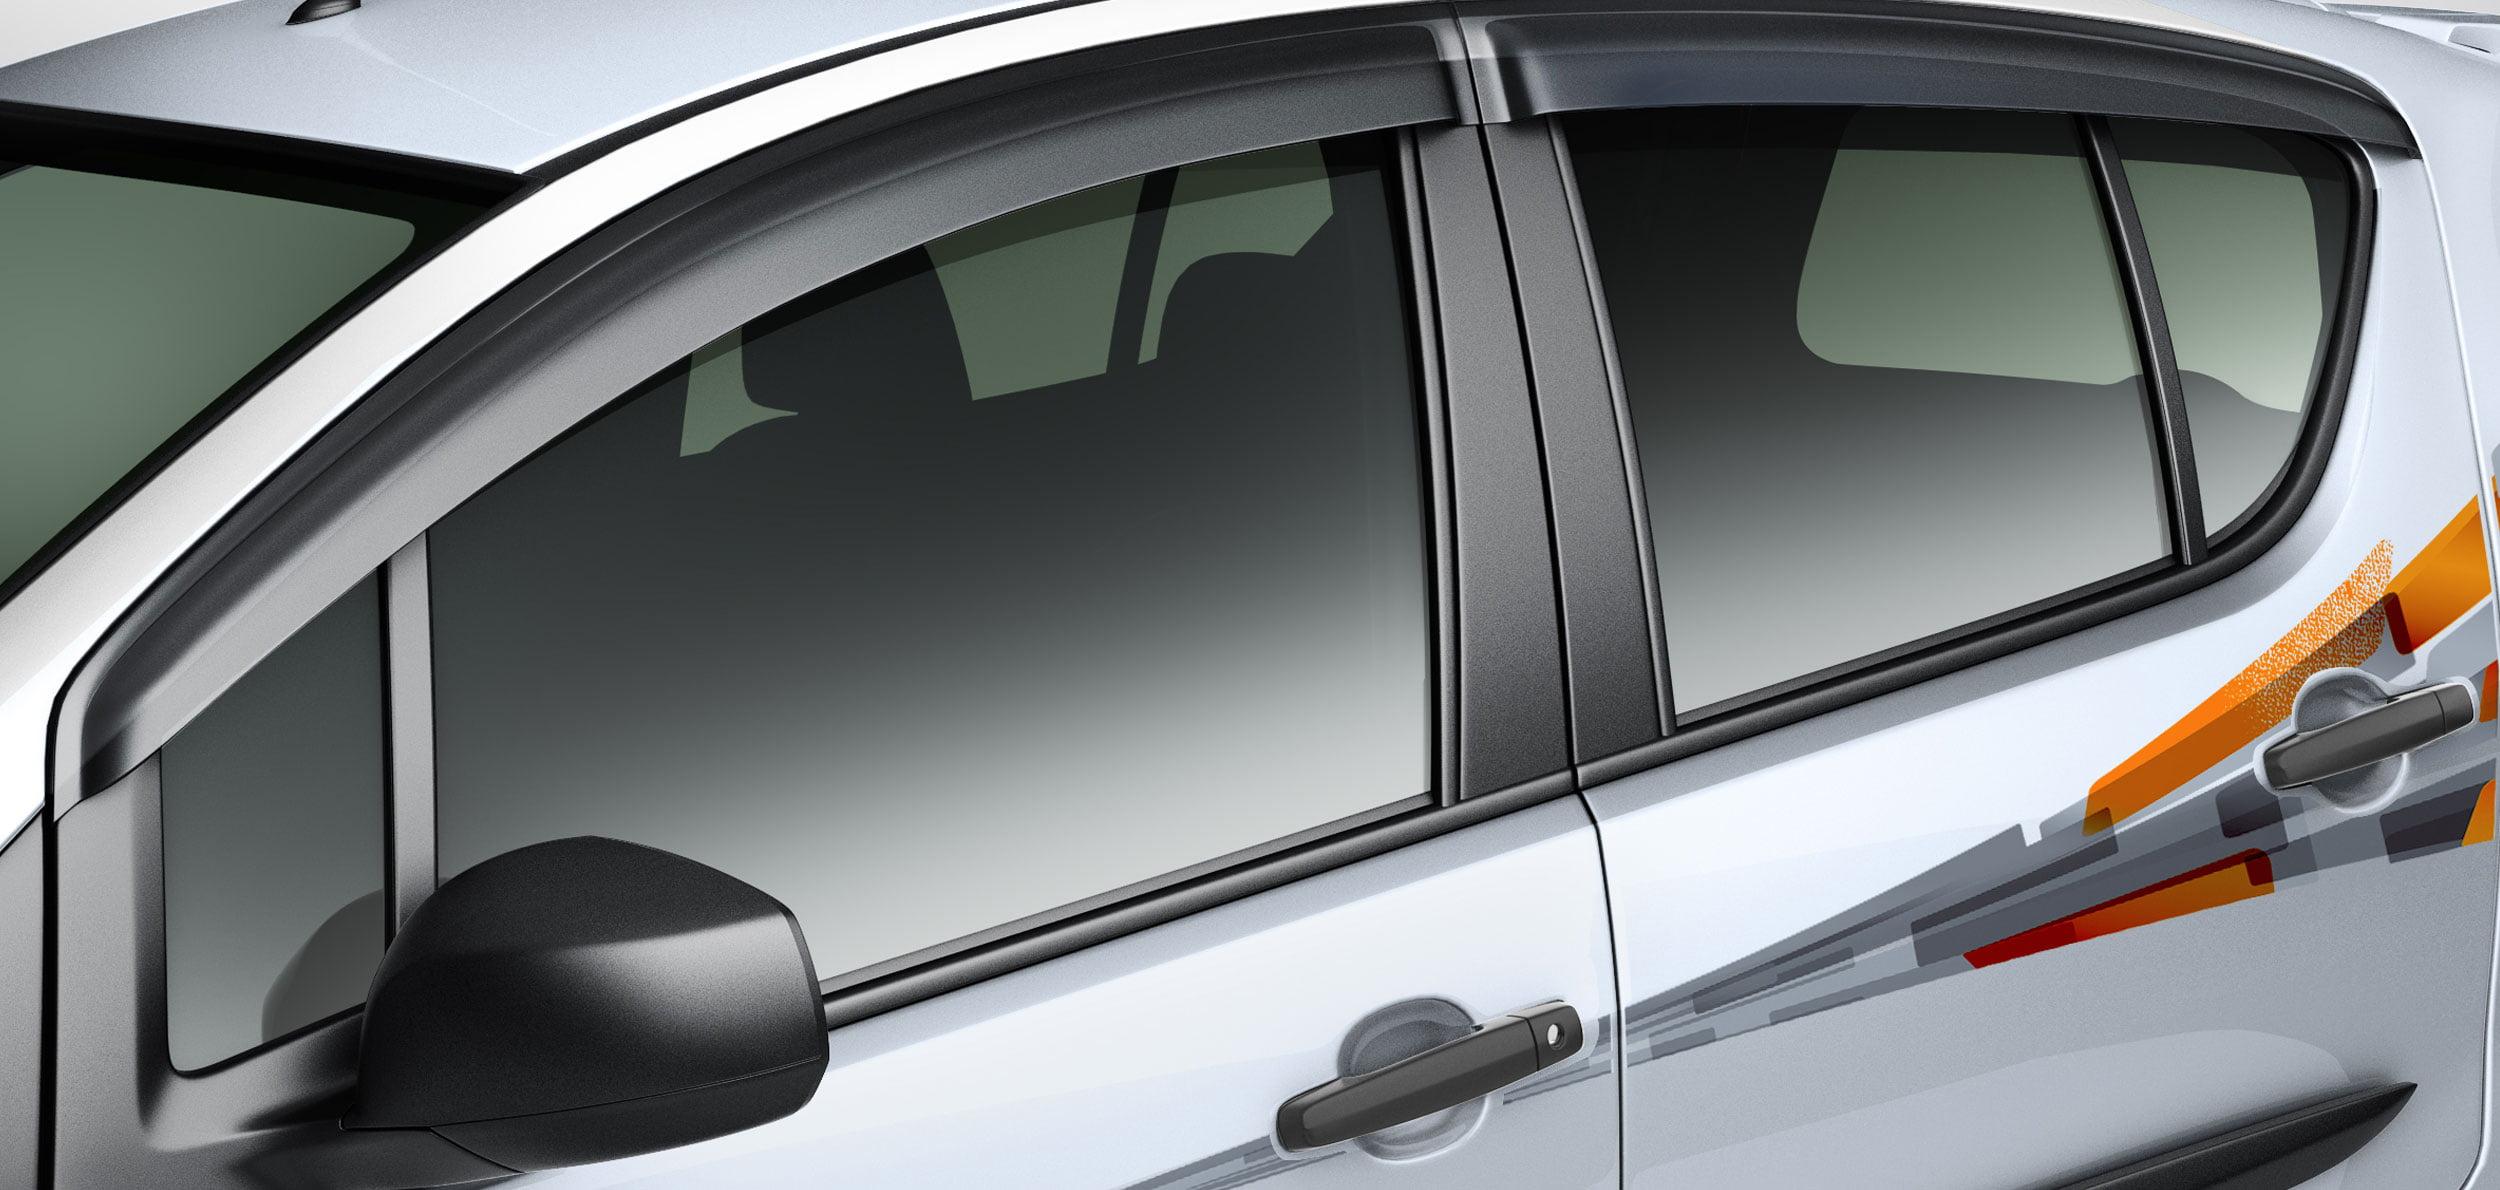 Maruti Suzuki Ritz Elate Special Edition Launched In India - Car body graphics for altomaruti dzire exteriorsinteriors genuine accessories